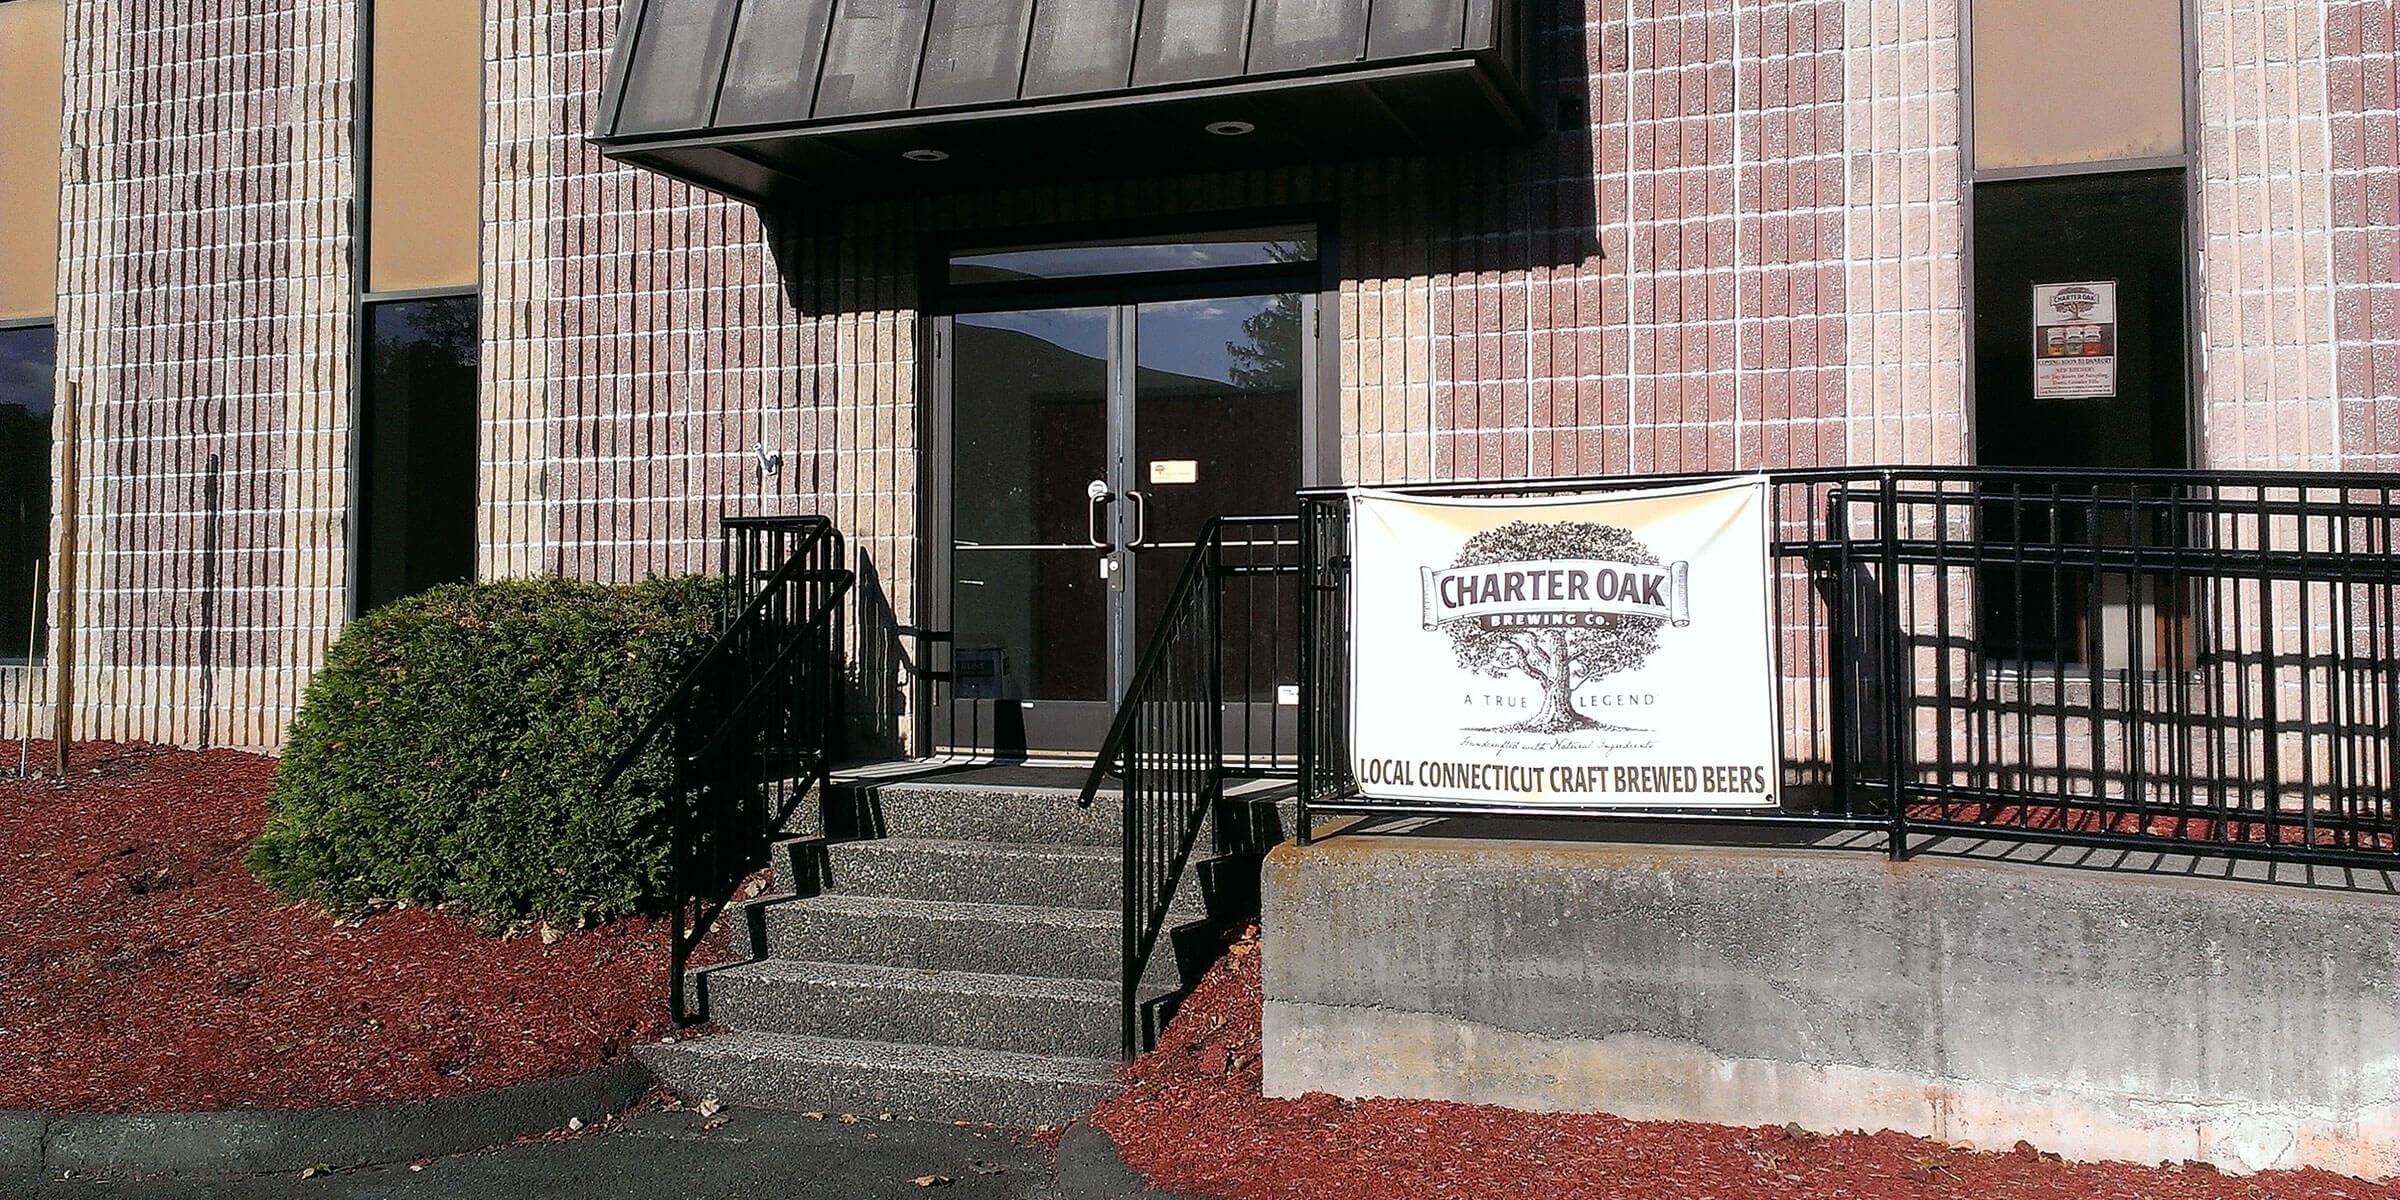 Outside the entrance ot Charter Oak Brewing Company in Danbury, Connecticut